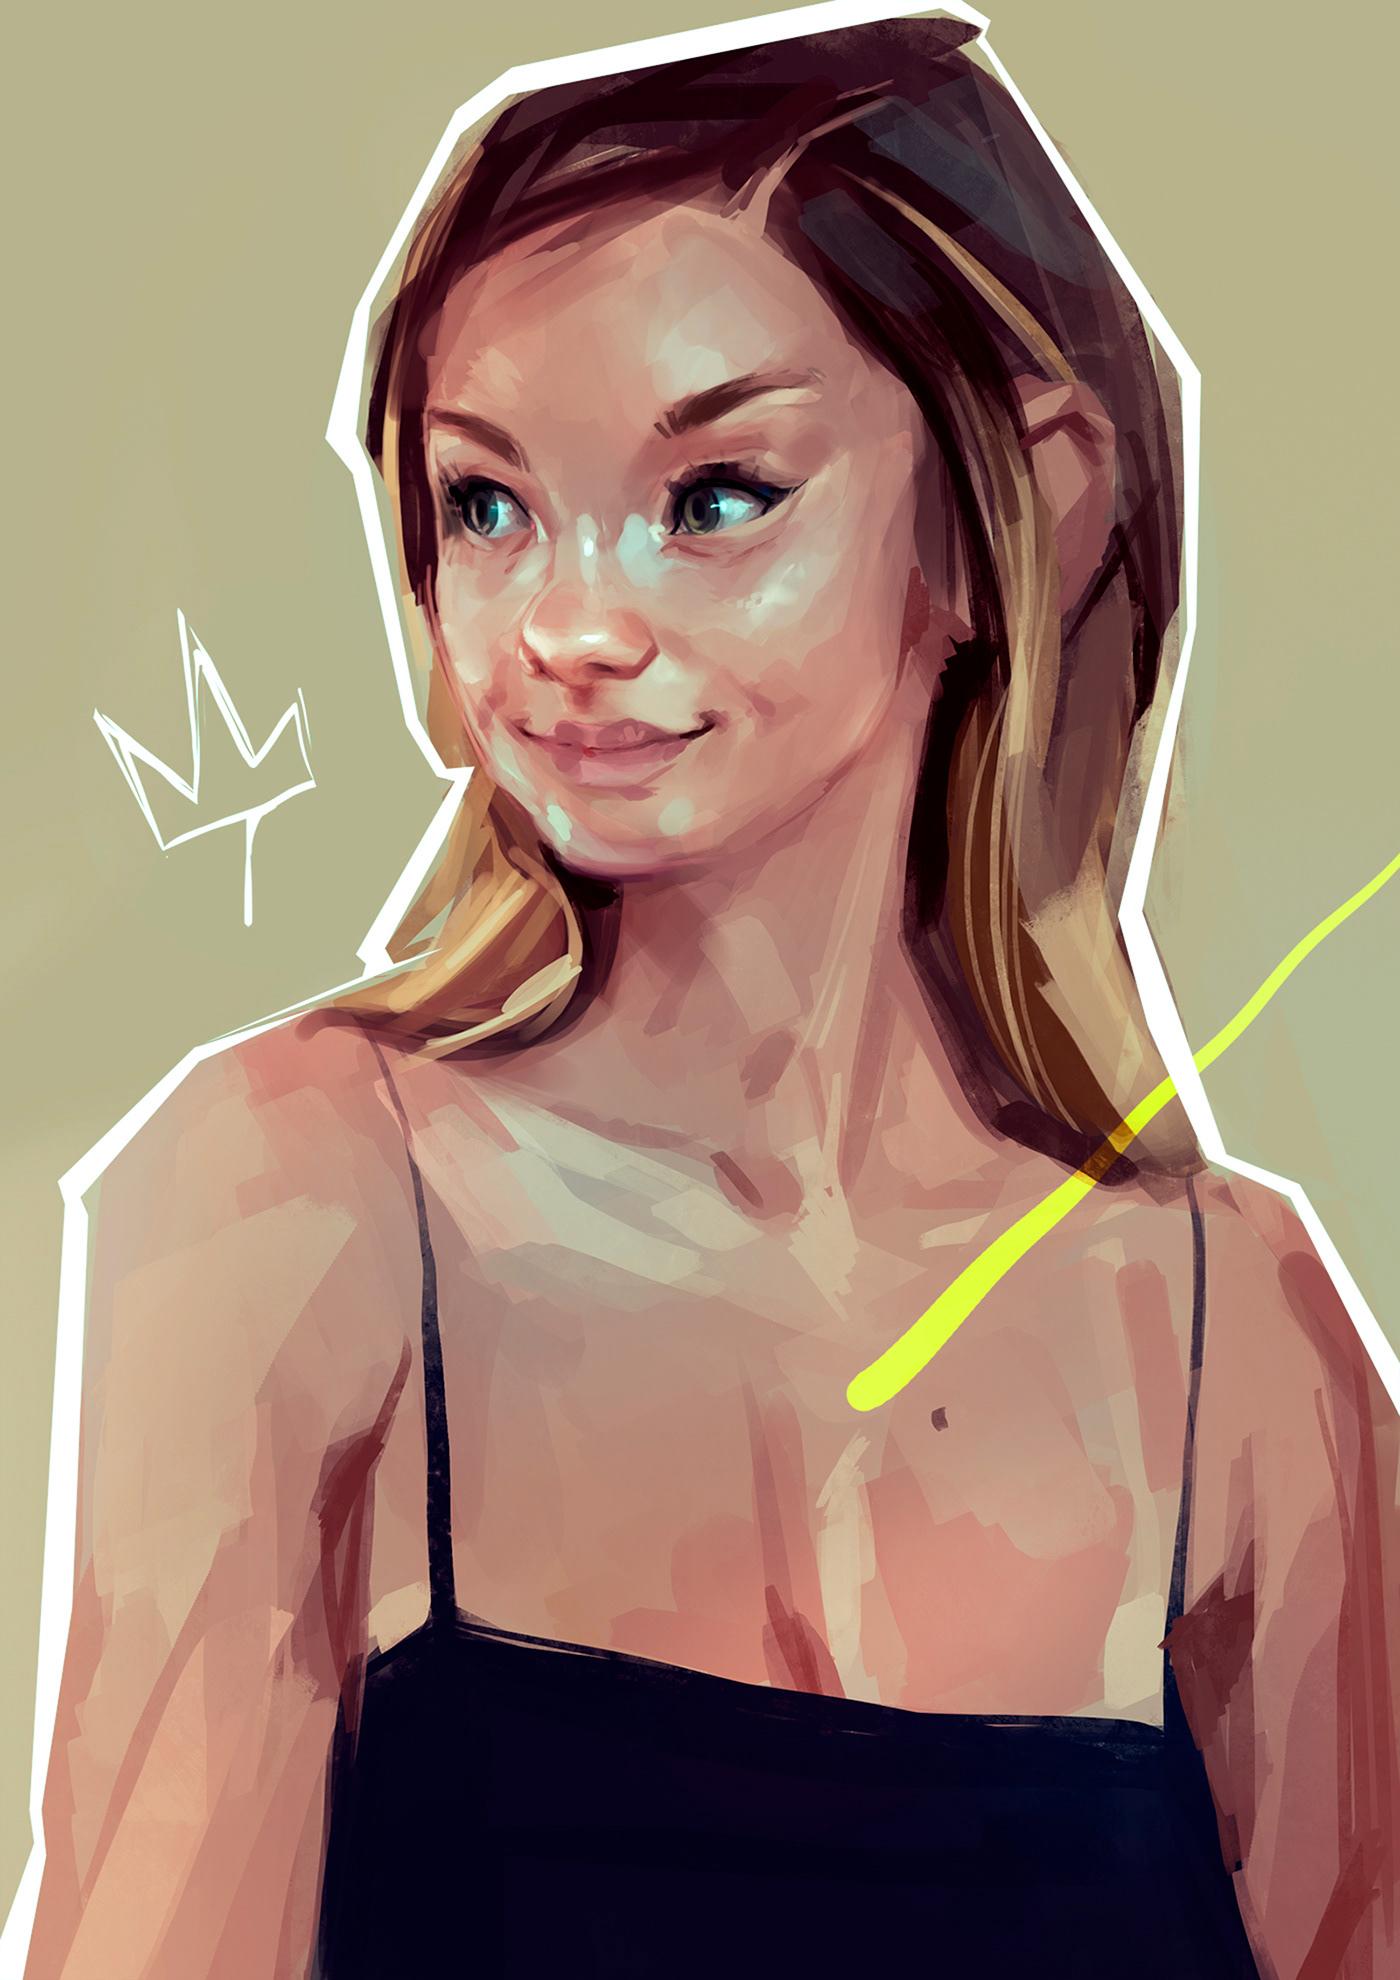 Image may contain: sketch, cartoon and human face